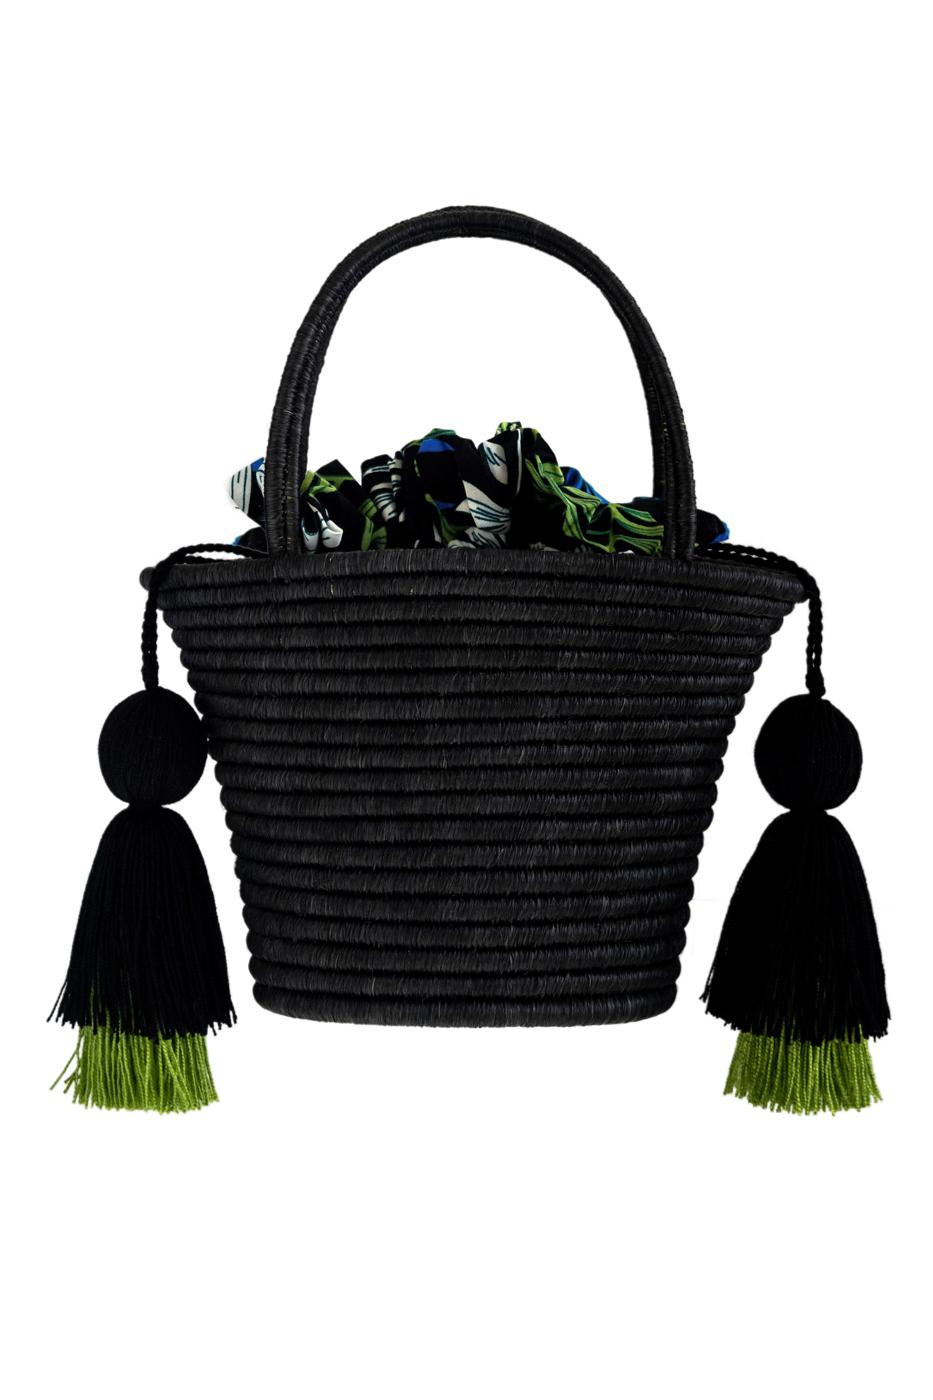 Bolsito Guacamayas- Negro con pompones verde oliva, negro